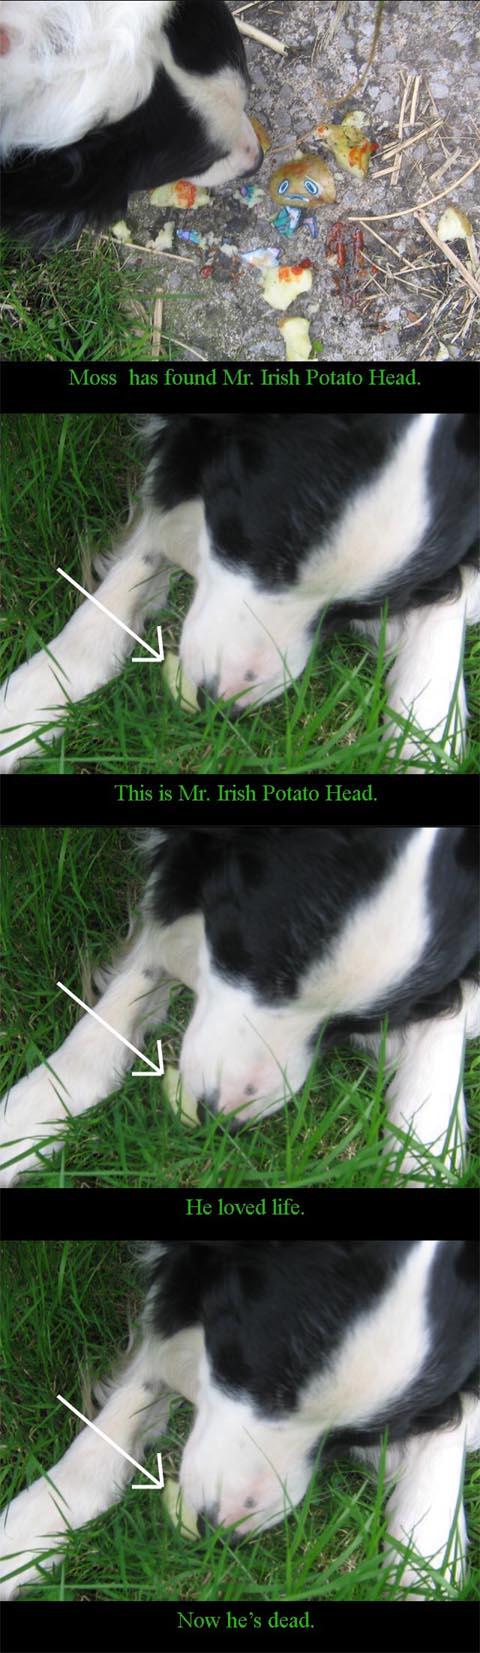 This is Mr. Irish Potato Head4 by Judan